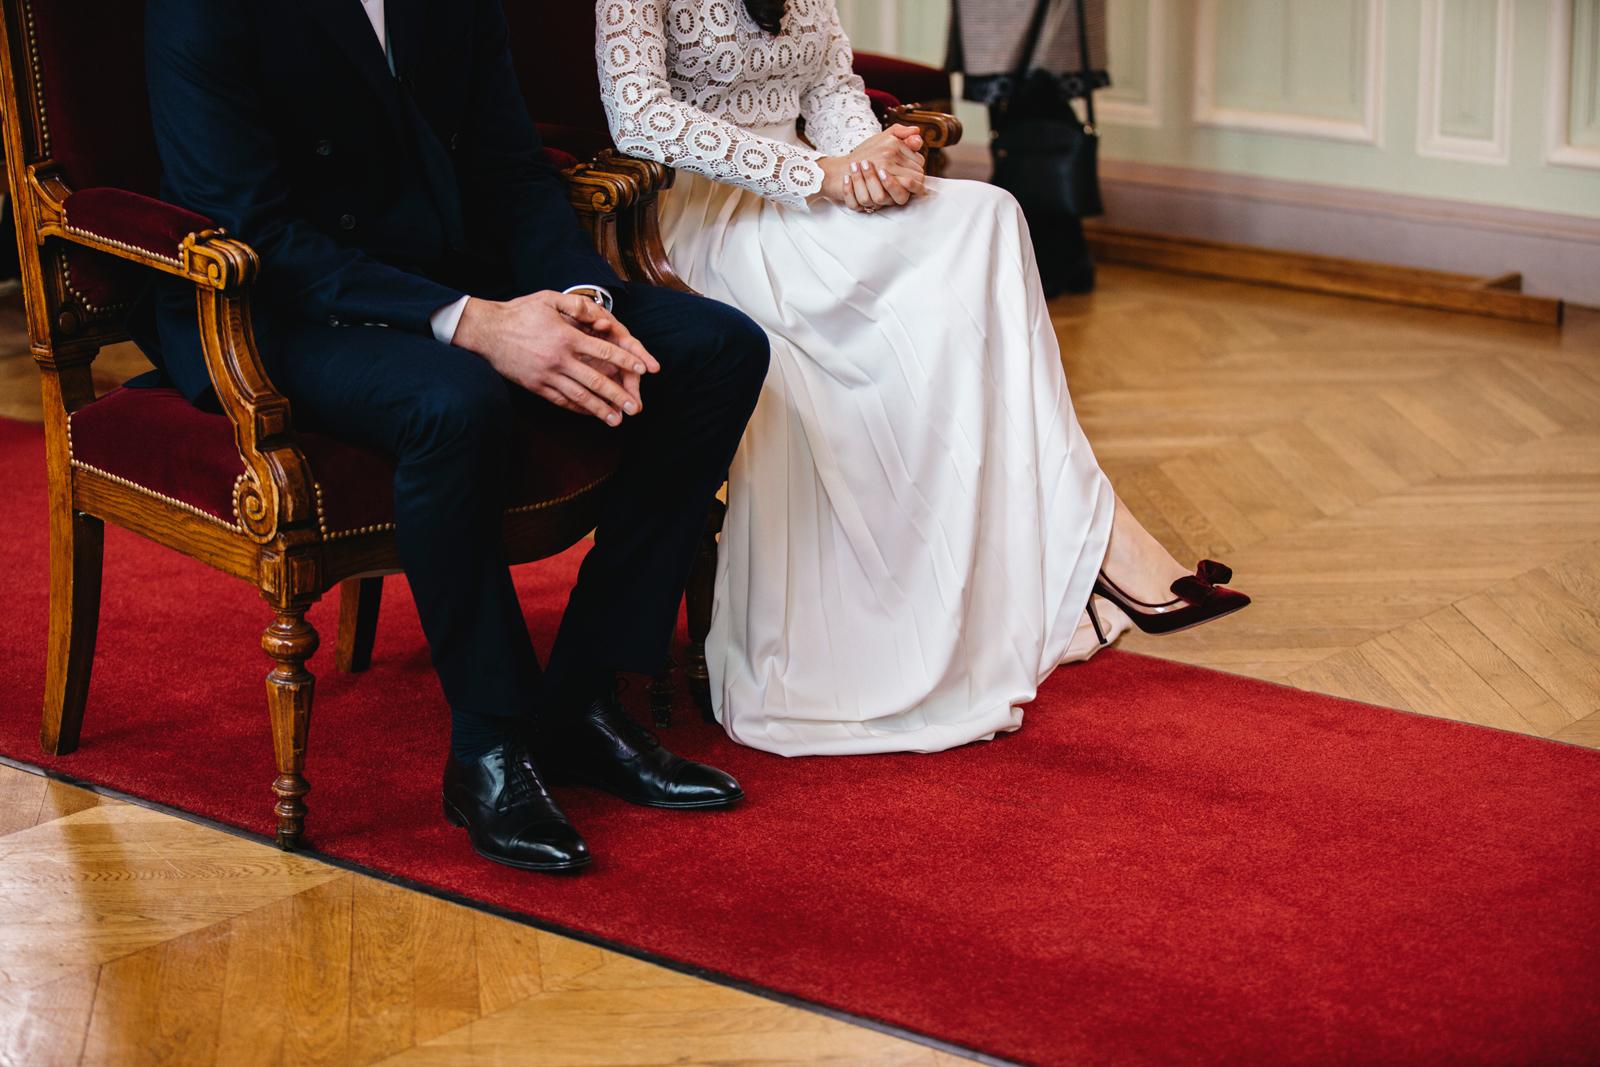 mariage-daphne-moreau-mode-and-the-city-civil-celine-marks27